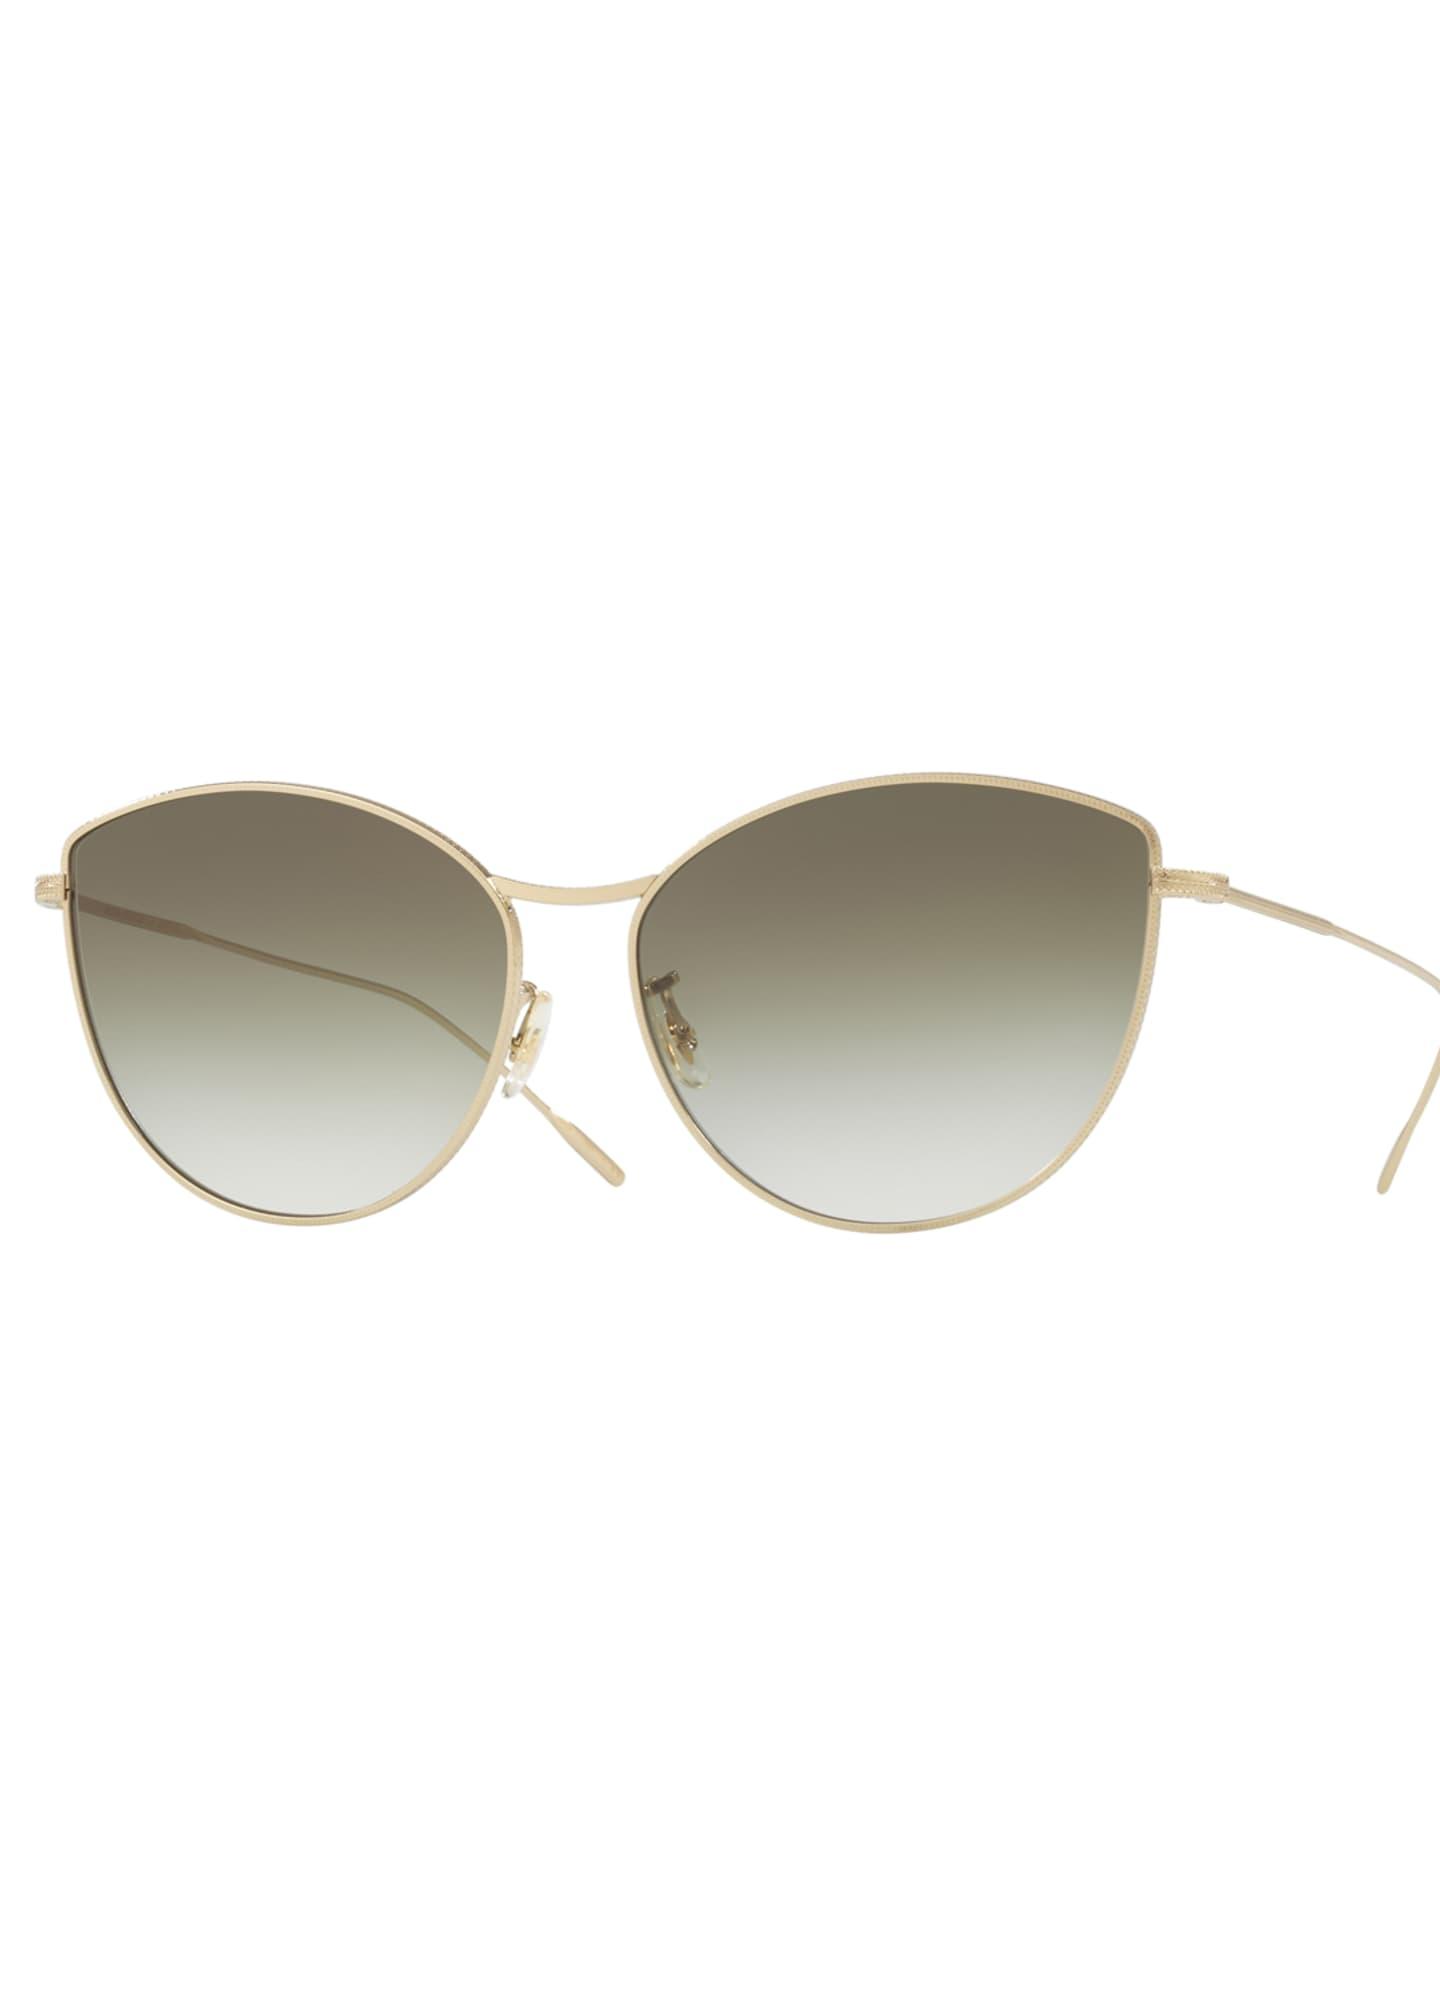 Oliver Peoples Rayette Vintage-Inspired Metal Cat-Eye Sunglasses,